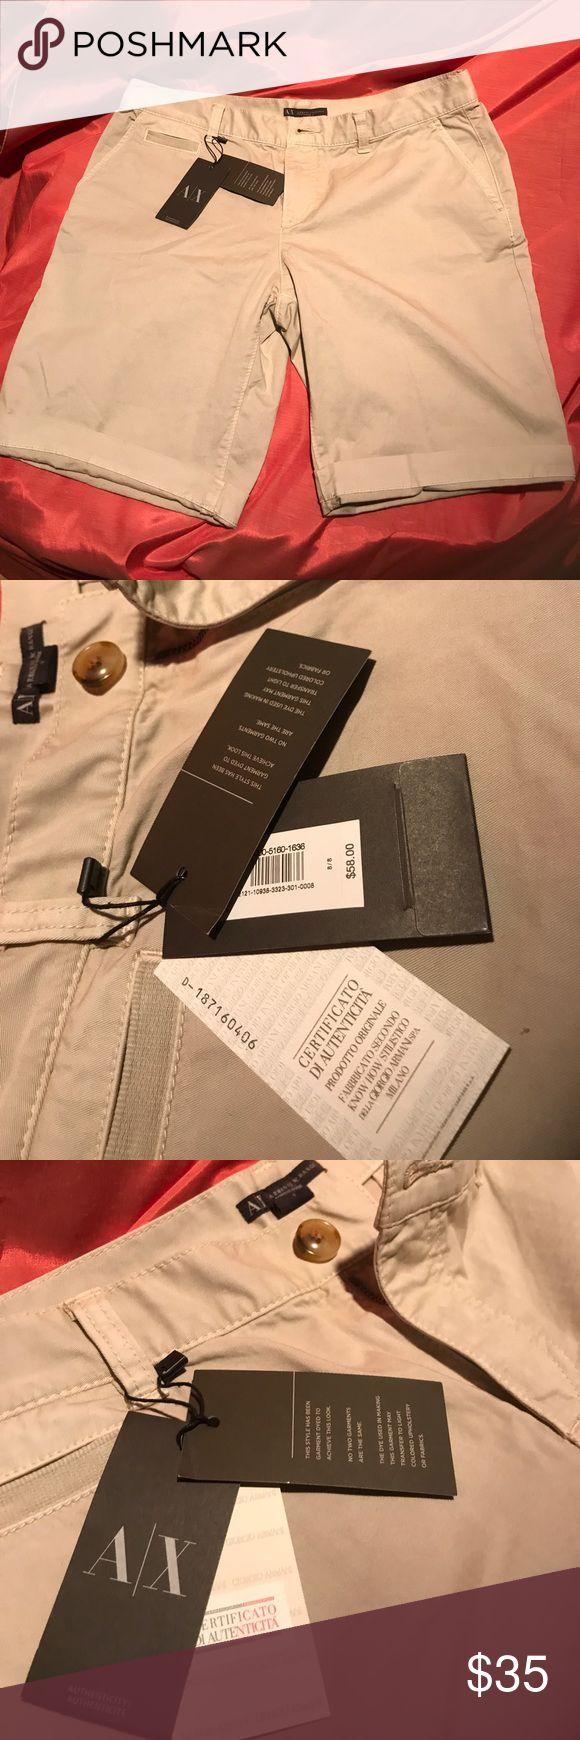 NWT A|X Armani Lightweight Khaki Shorts Sz8 Authentic & Classic! Armani Exchange Shorts